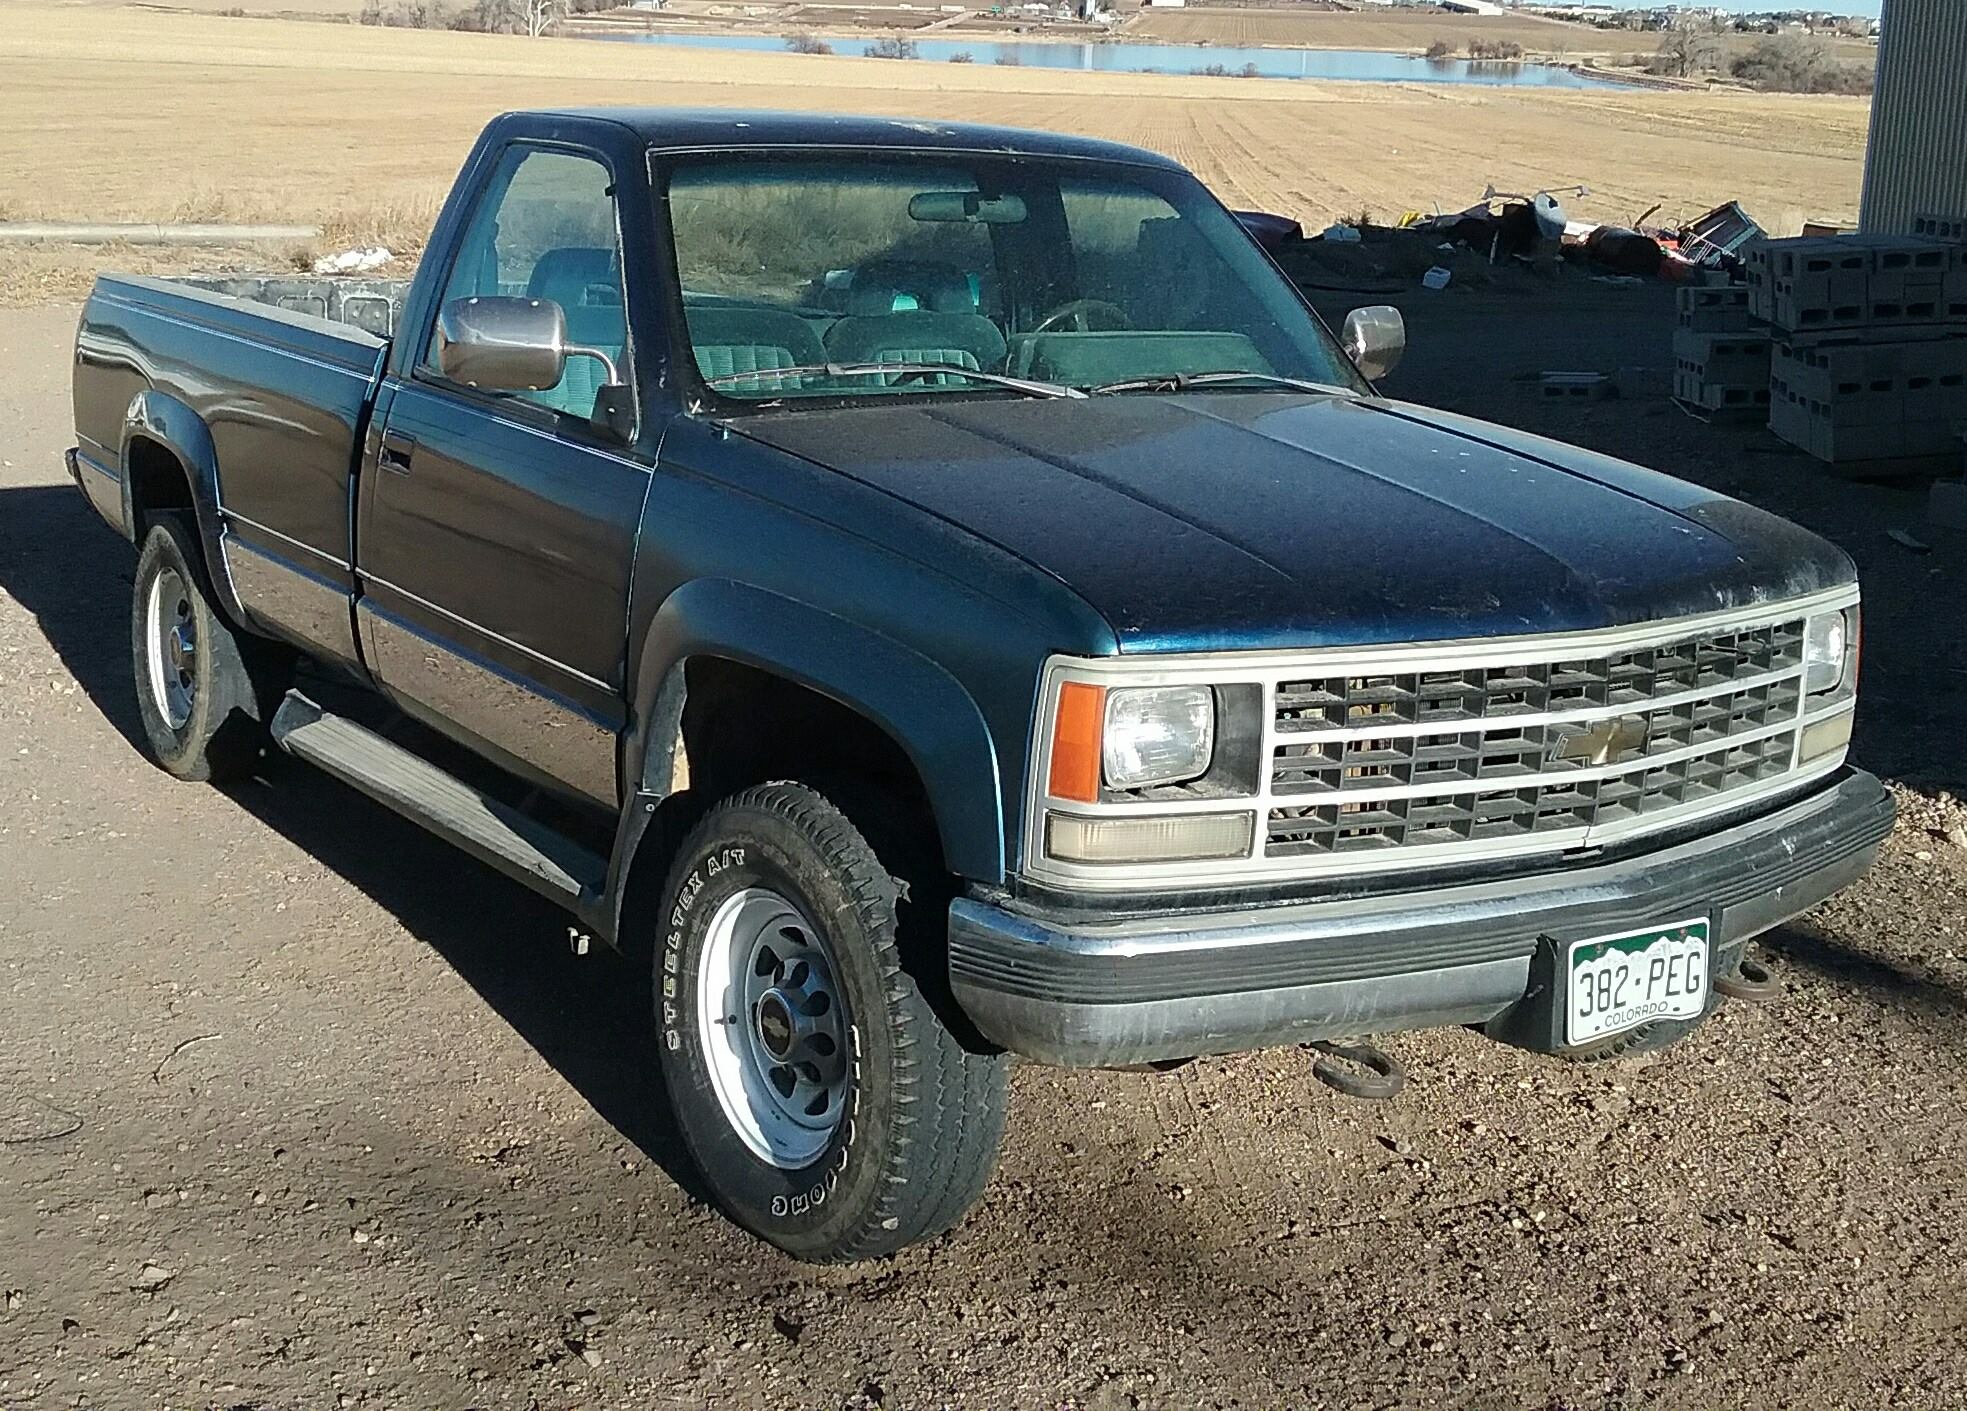 1993 Chevrolet 2500 pick-up